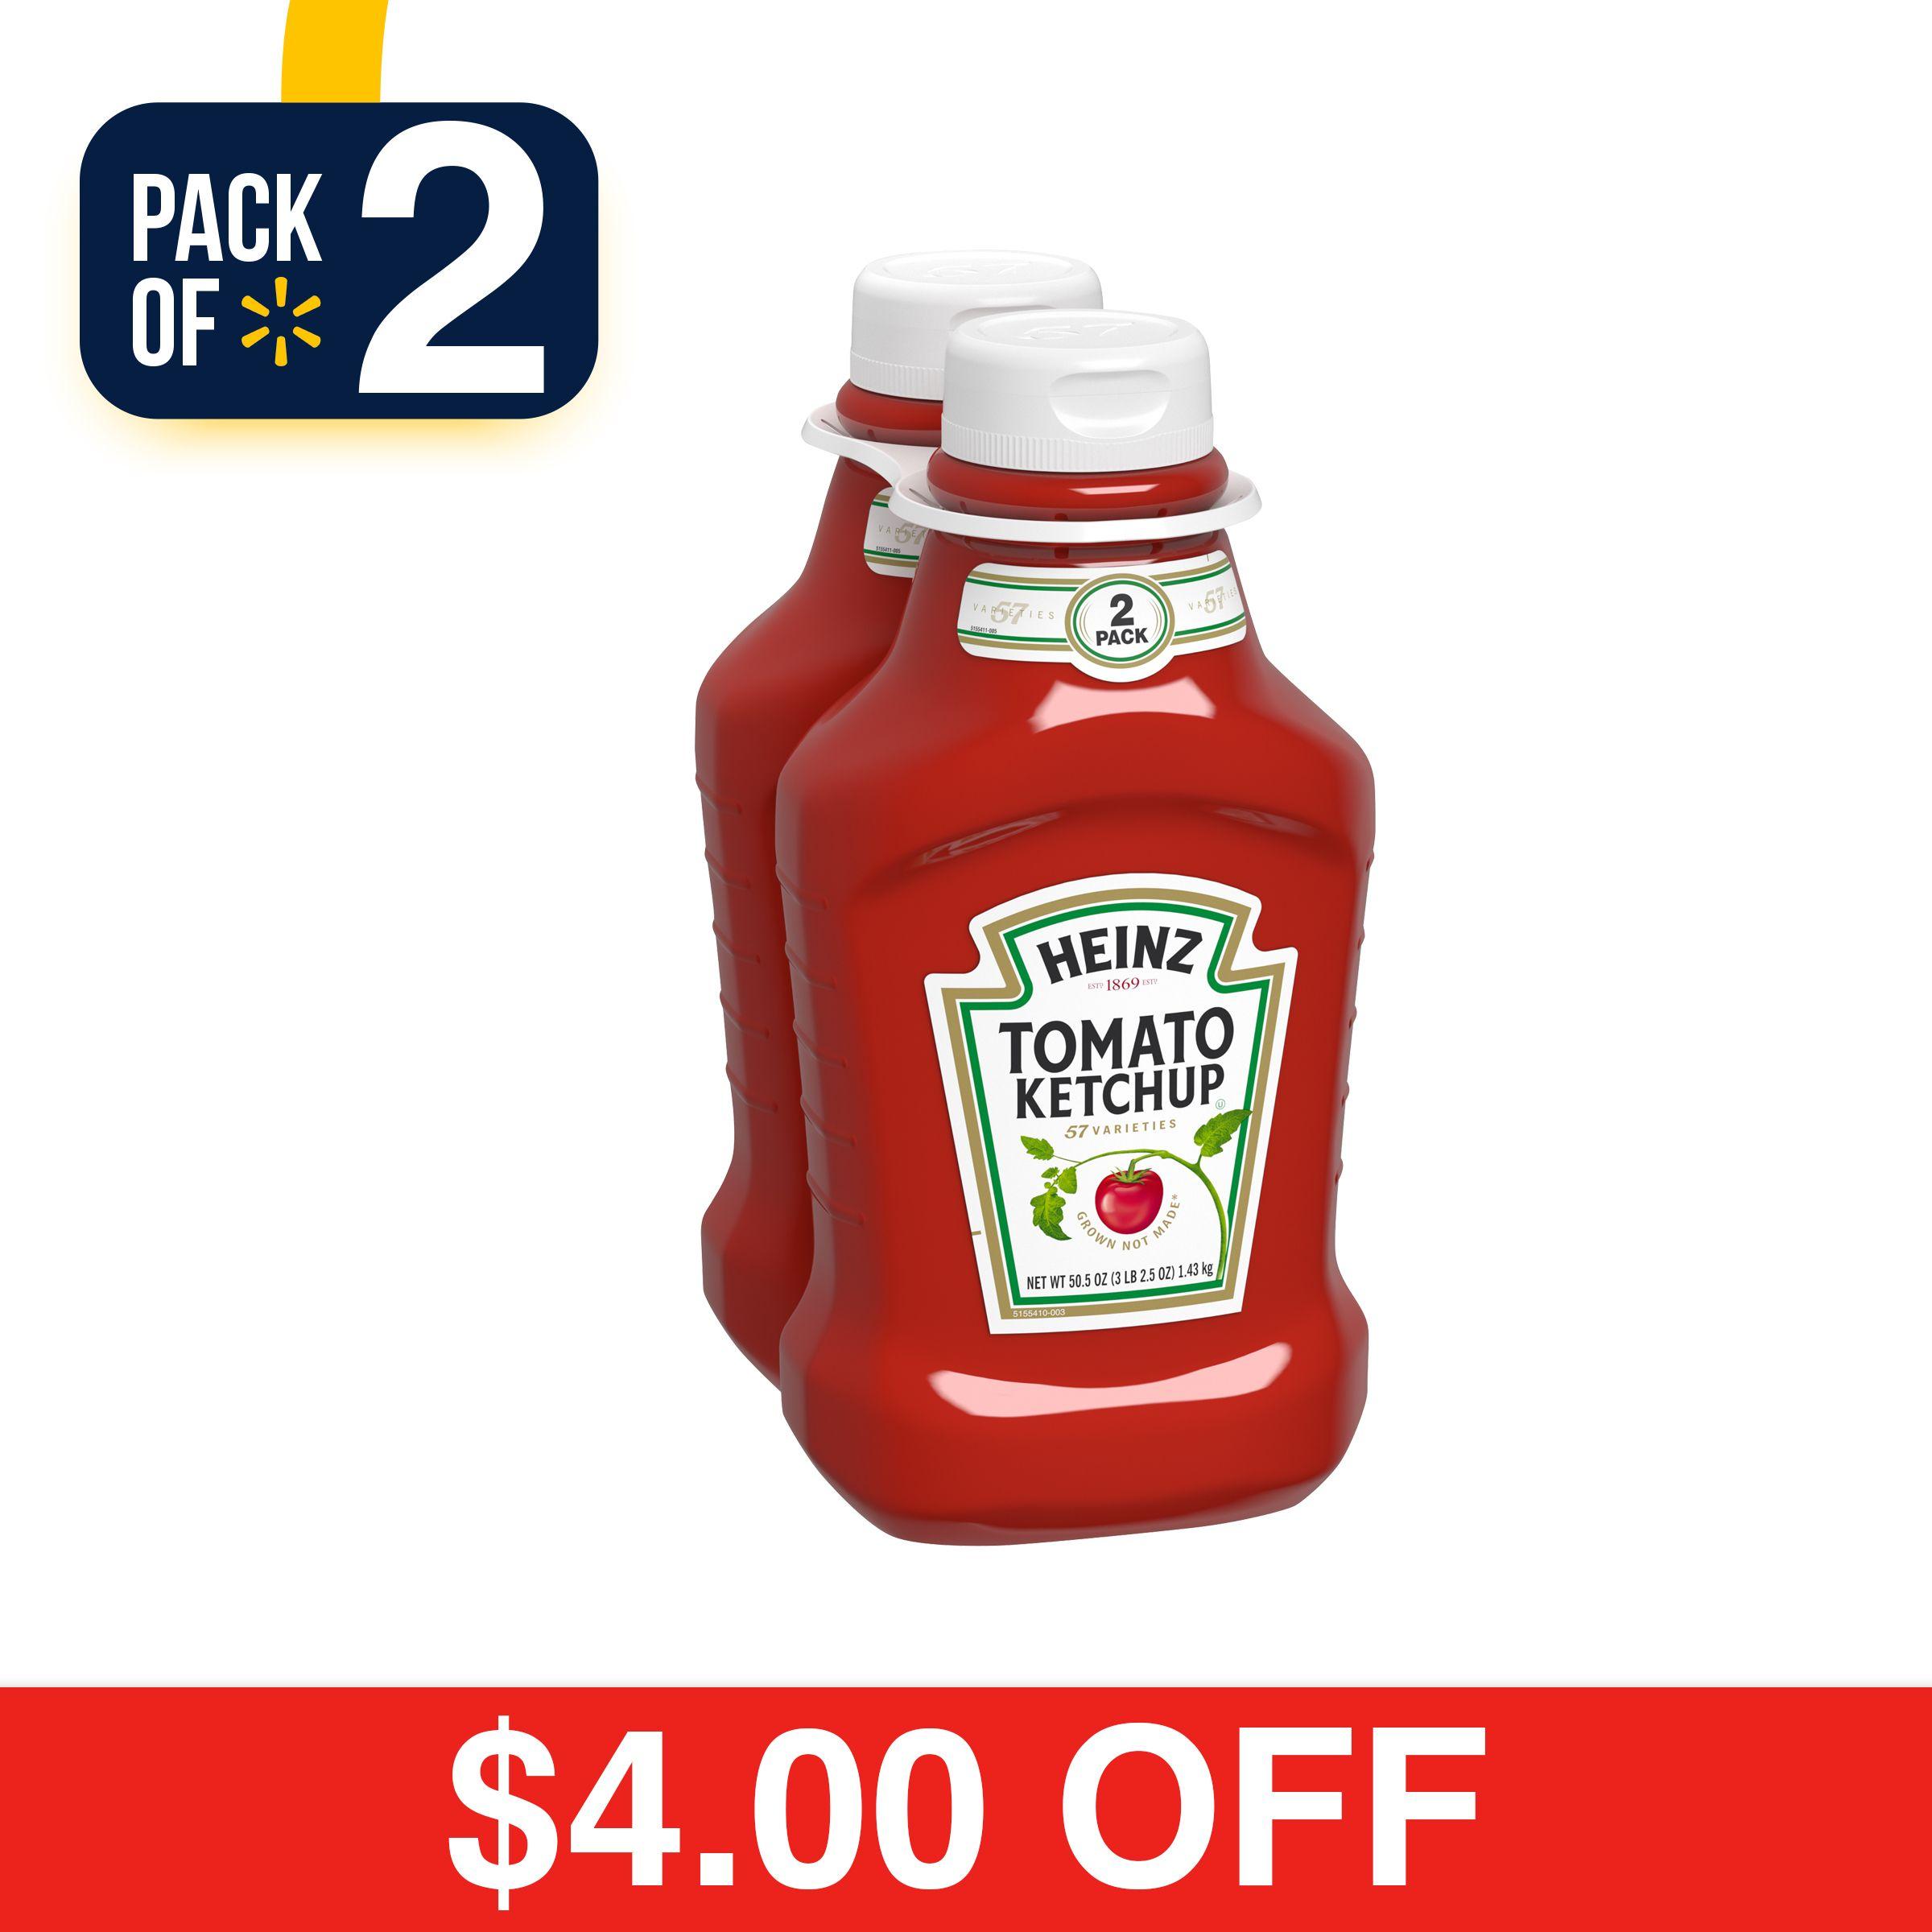 Heinz tomato ketchup 2 505 oz multipack salty snacks